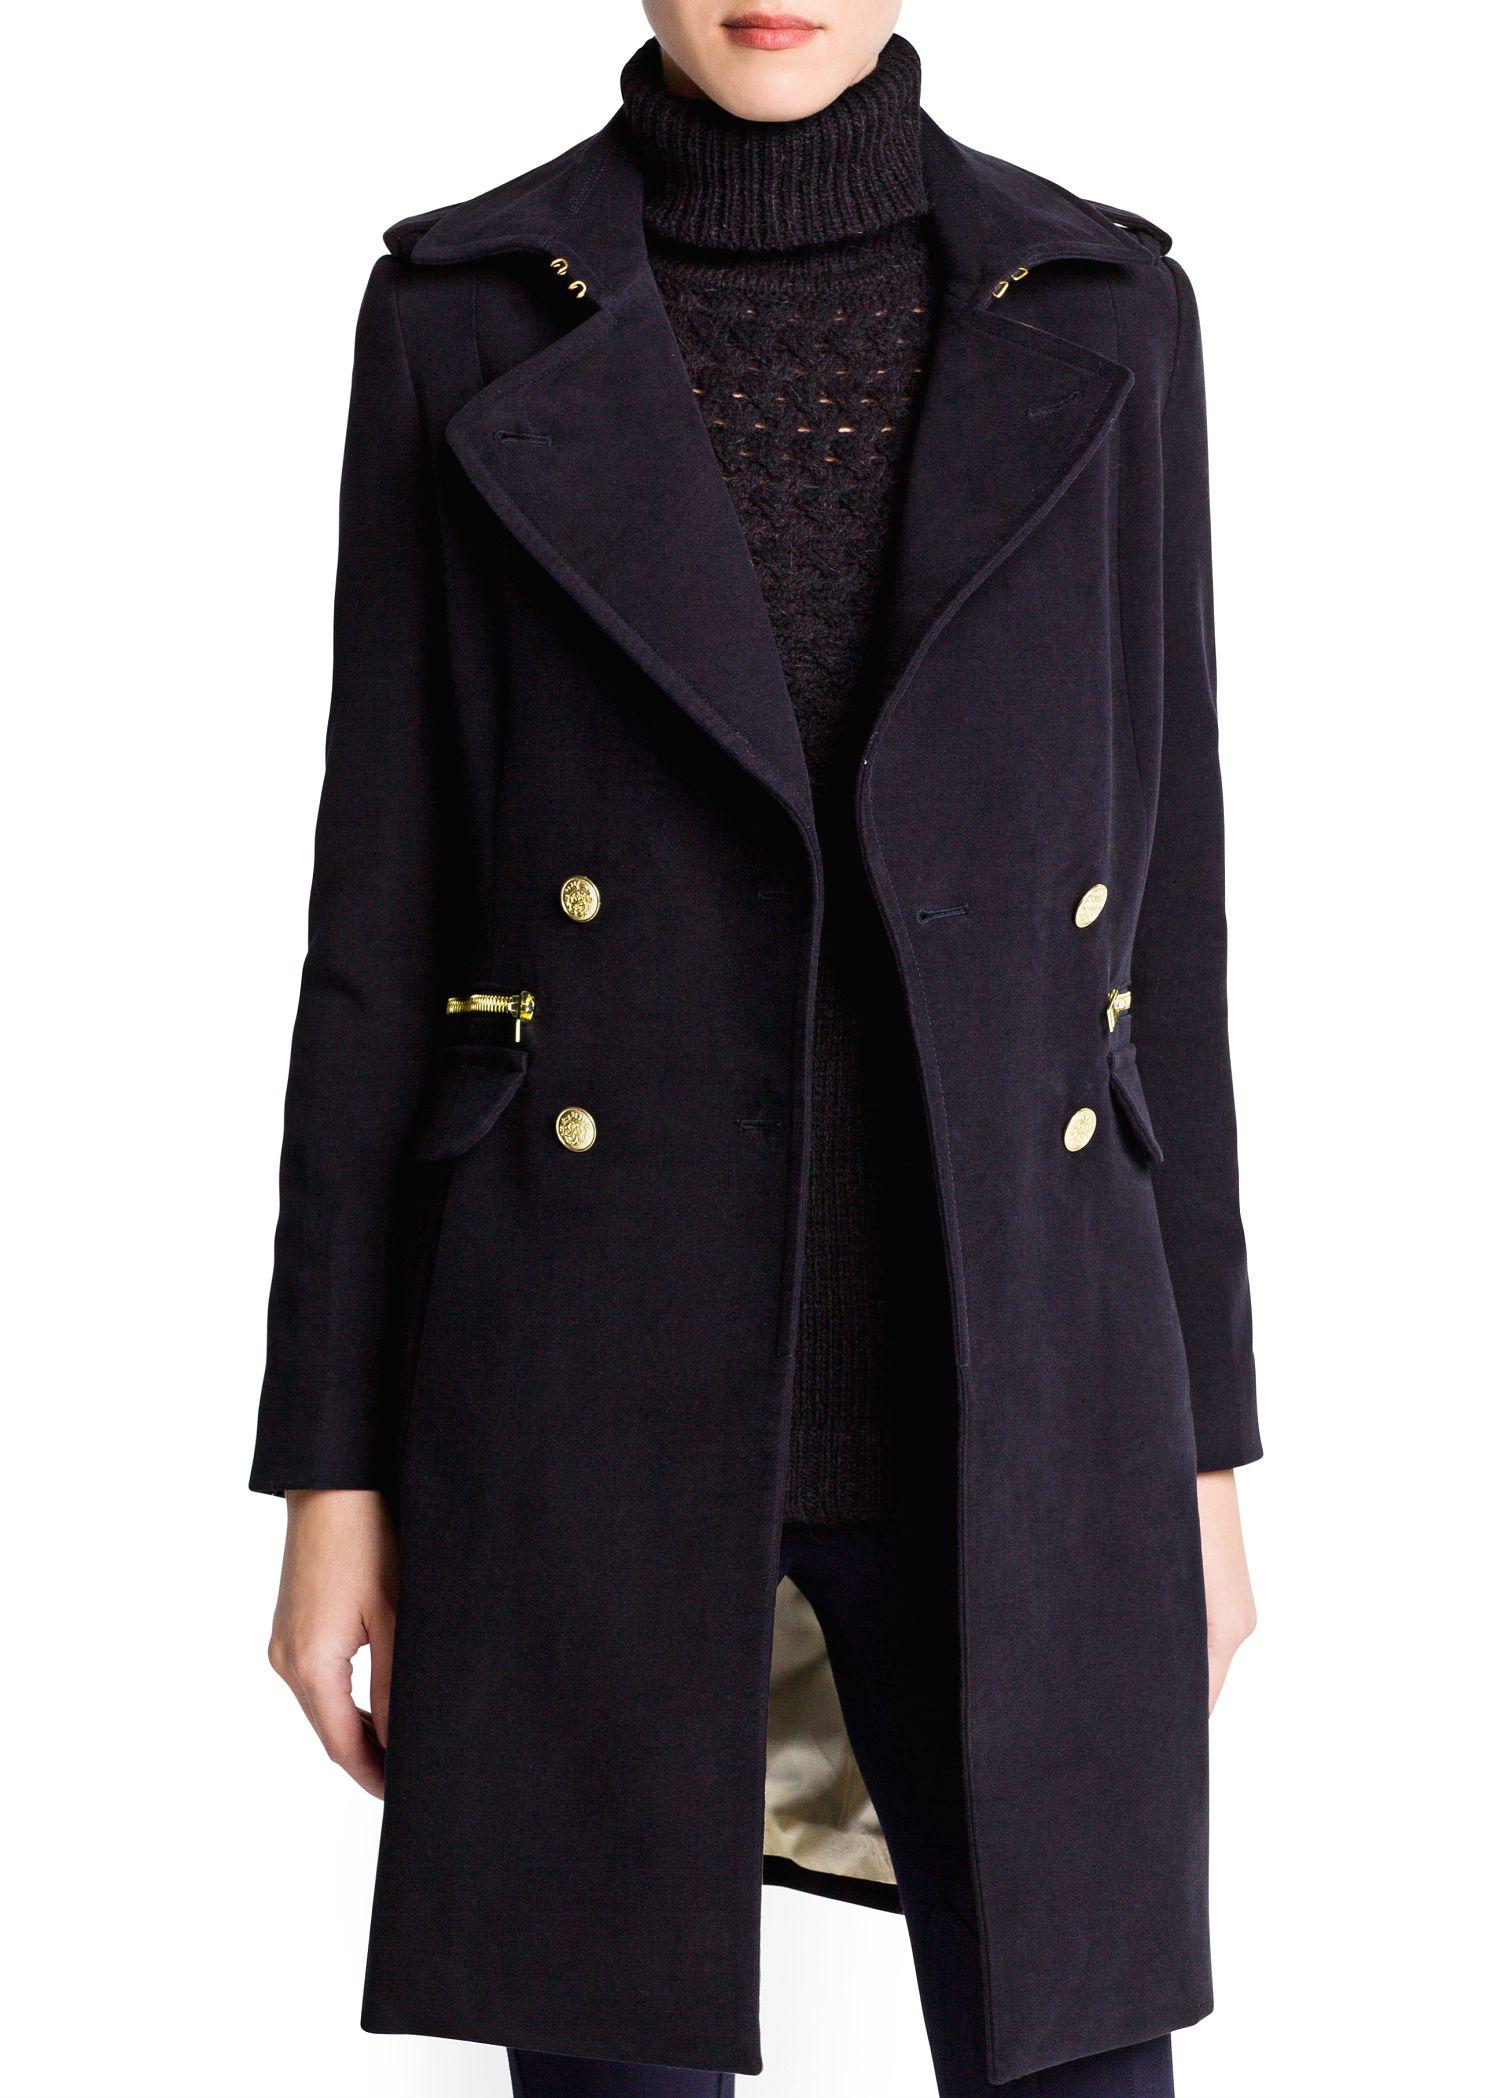 Mango Military Style Long Coat in Black | Lyst